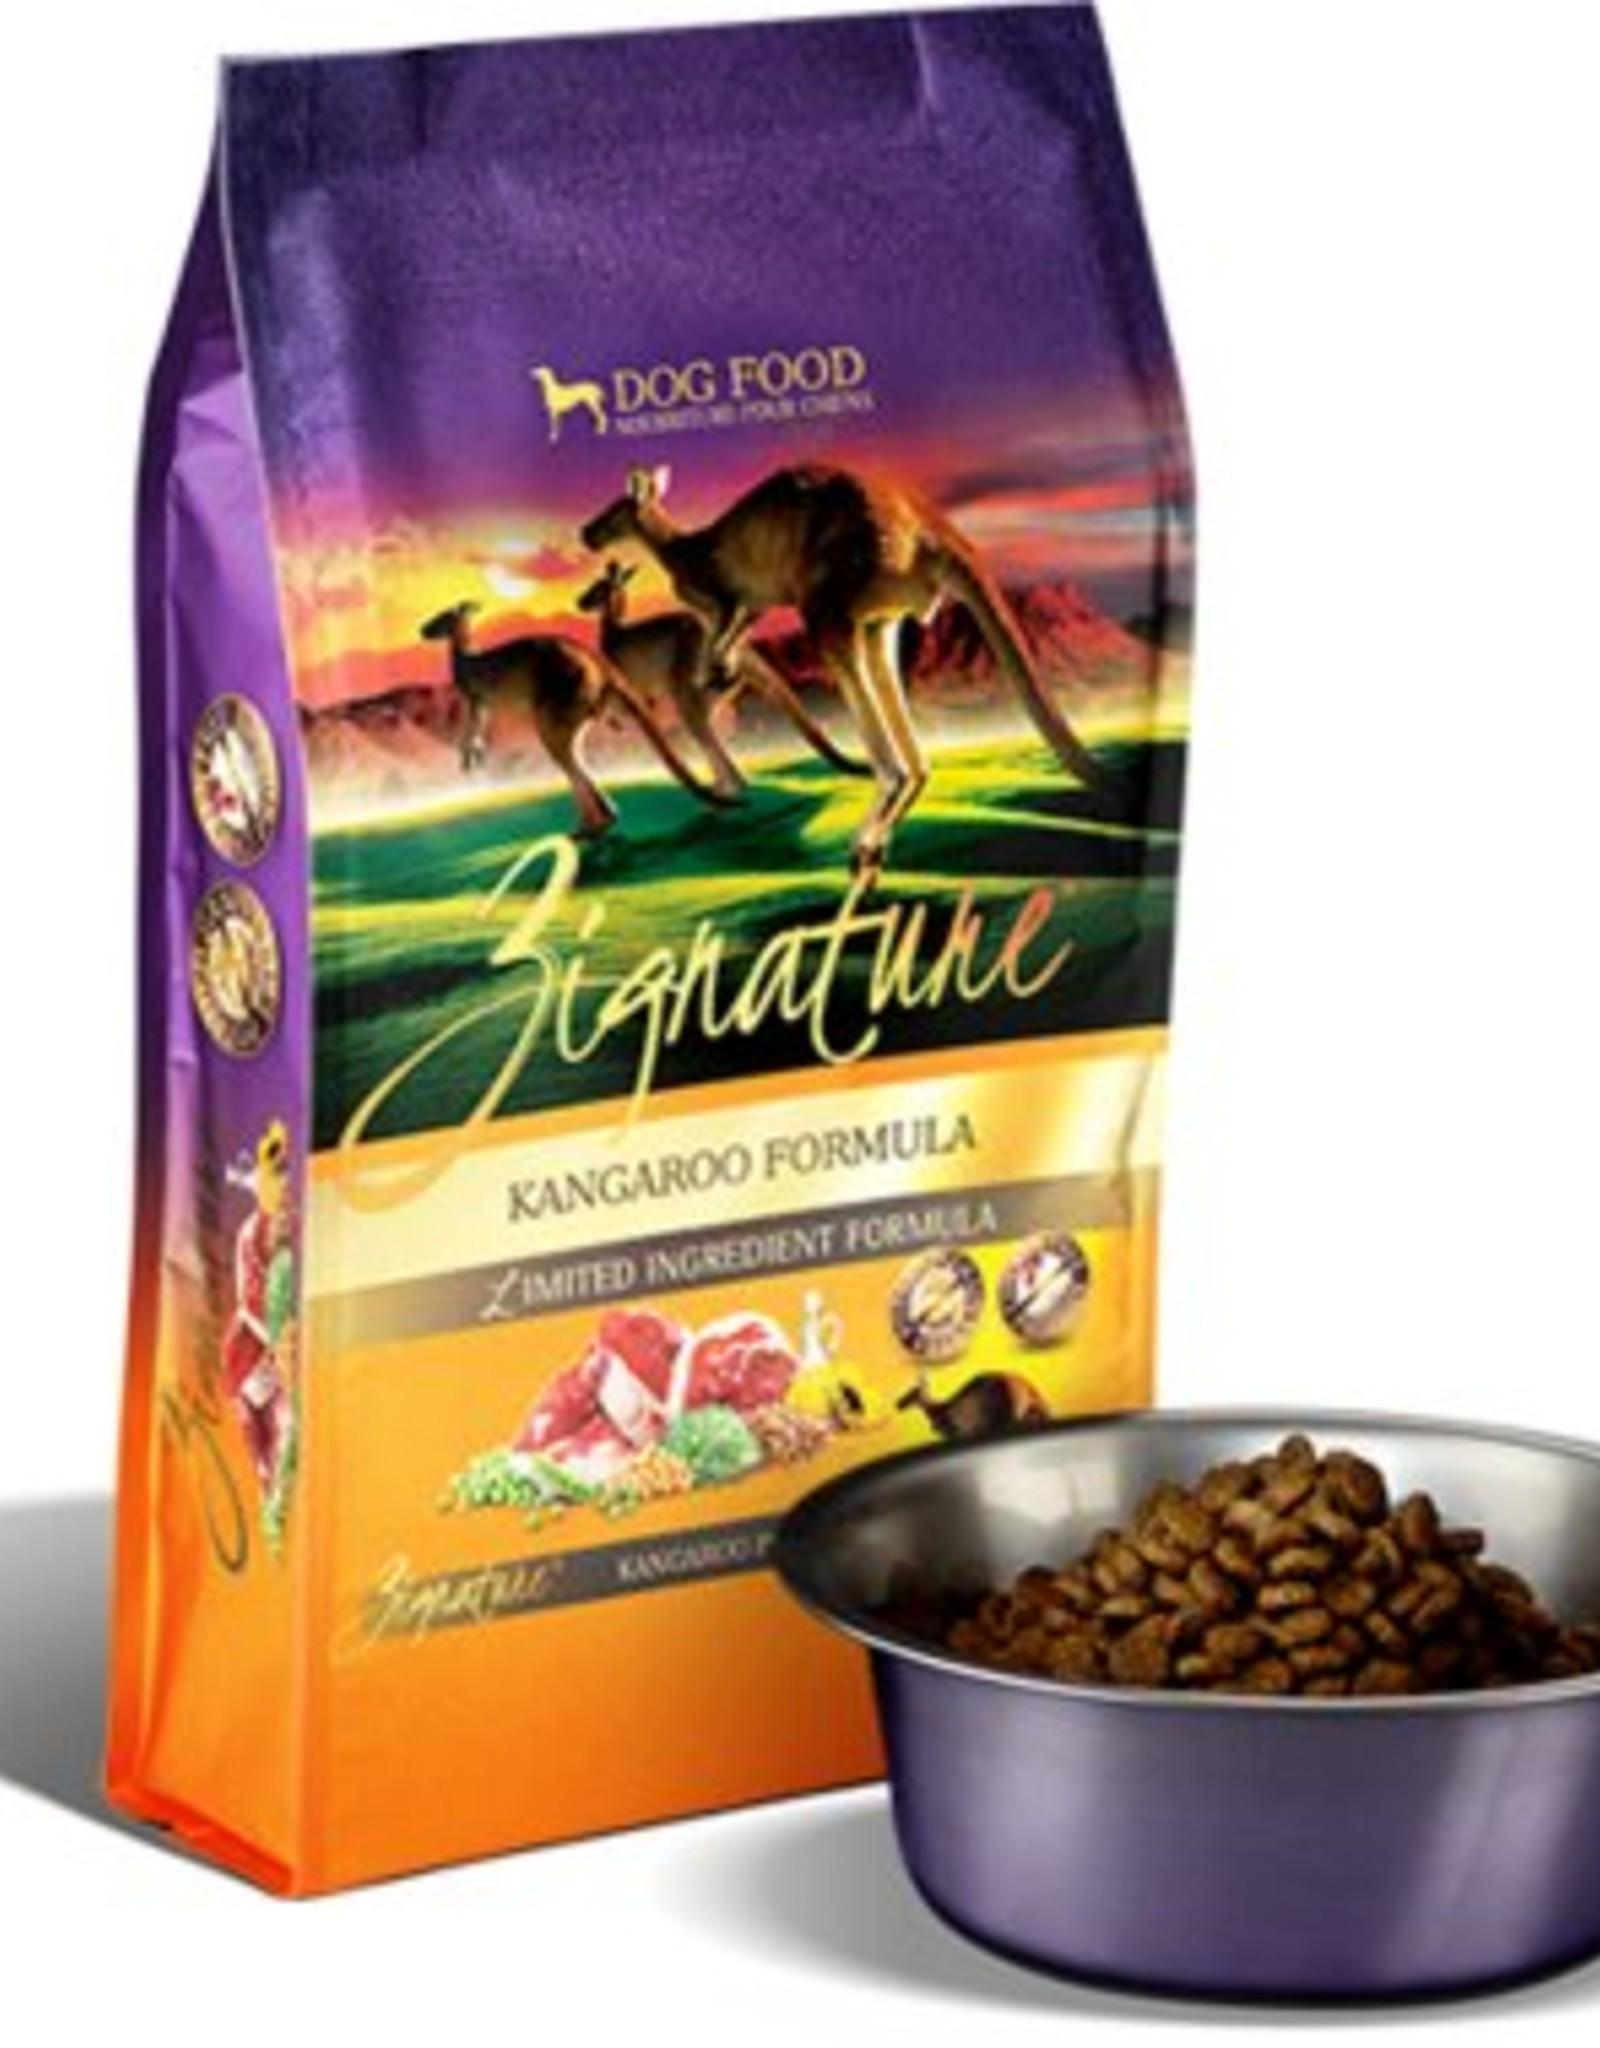 Zignature Kangaroo Limited Ingredient Formula Grain-Free Dry Dog Food